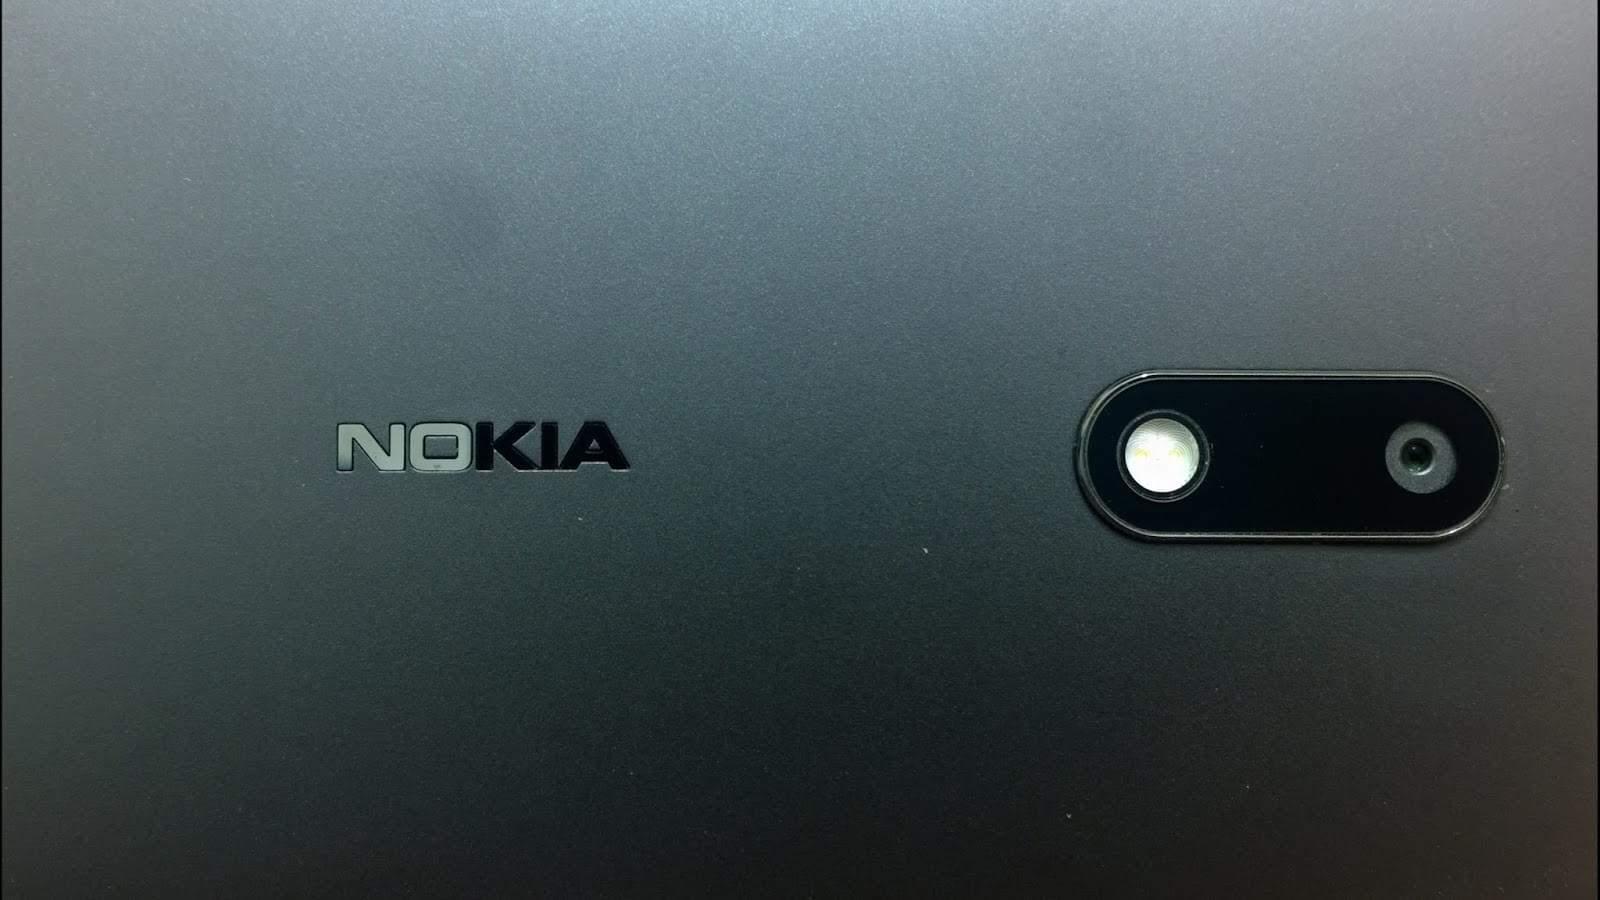 Nokia 6 logo pain peels off 2